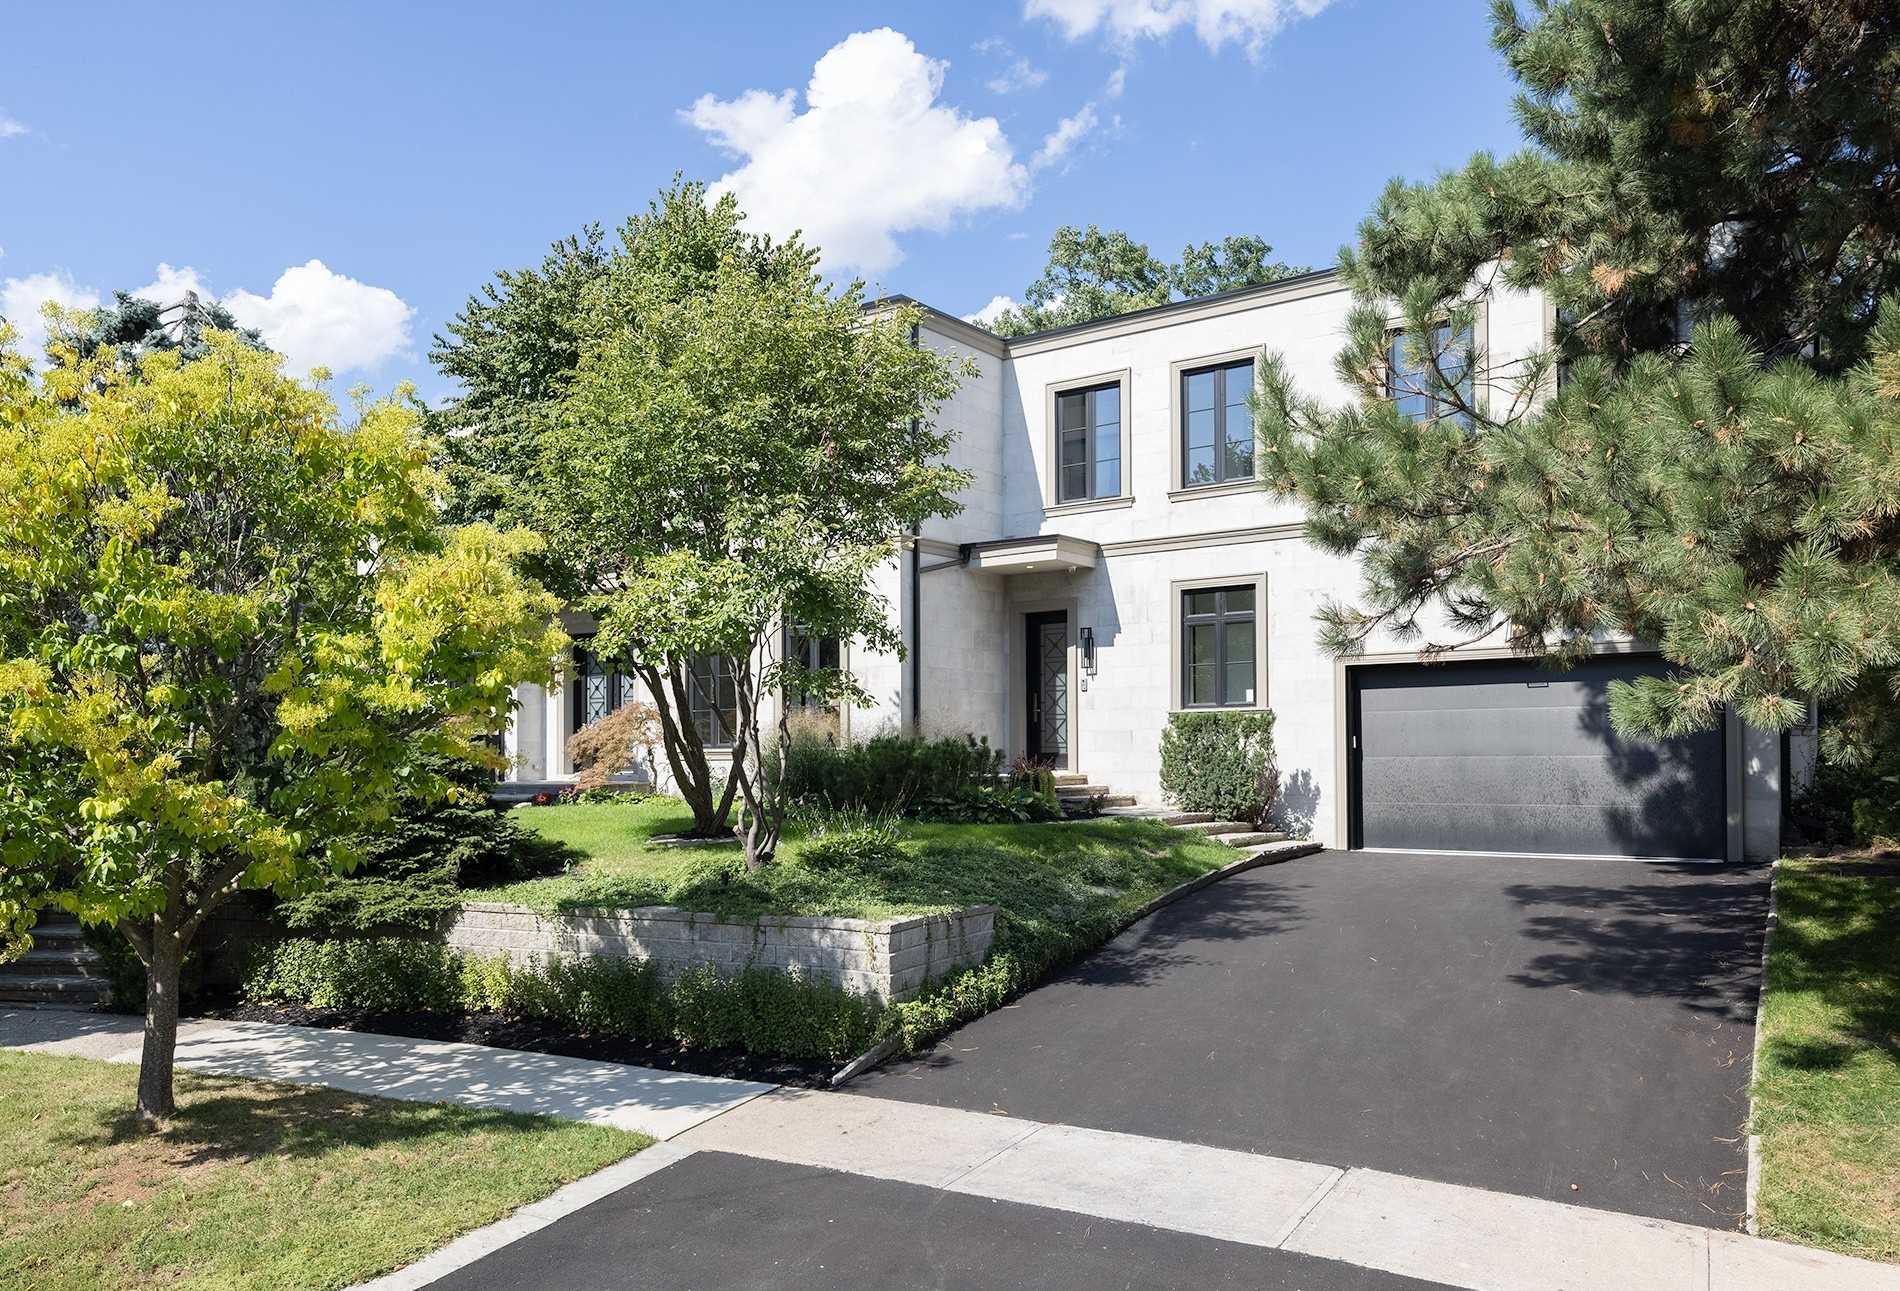 4 Braywin Dr, Toronto, Ontario M9P2P1, 4 Bedrooms Bedrooms, 10 Rooms Rooms,5 BathroomsBathrooms,Detached,For Sale,Braywin,W5380096